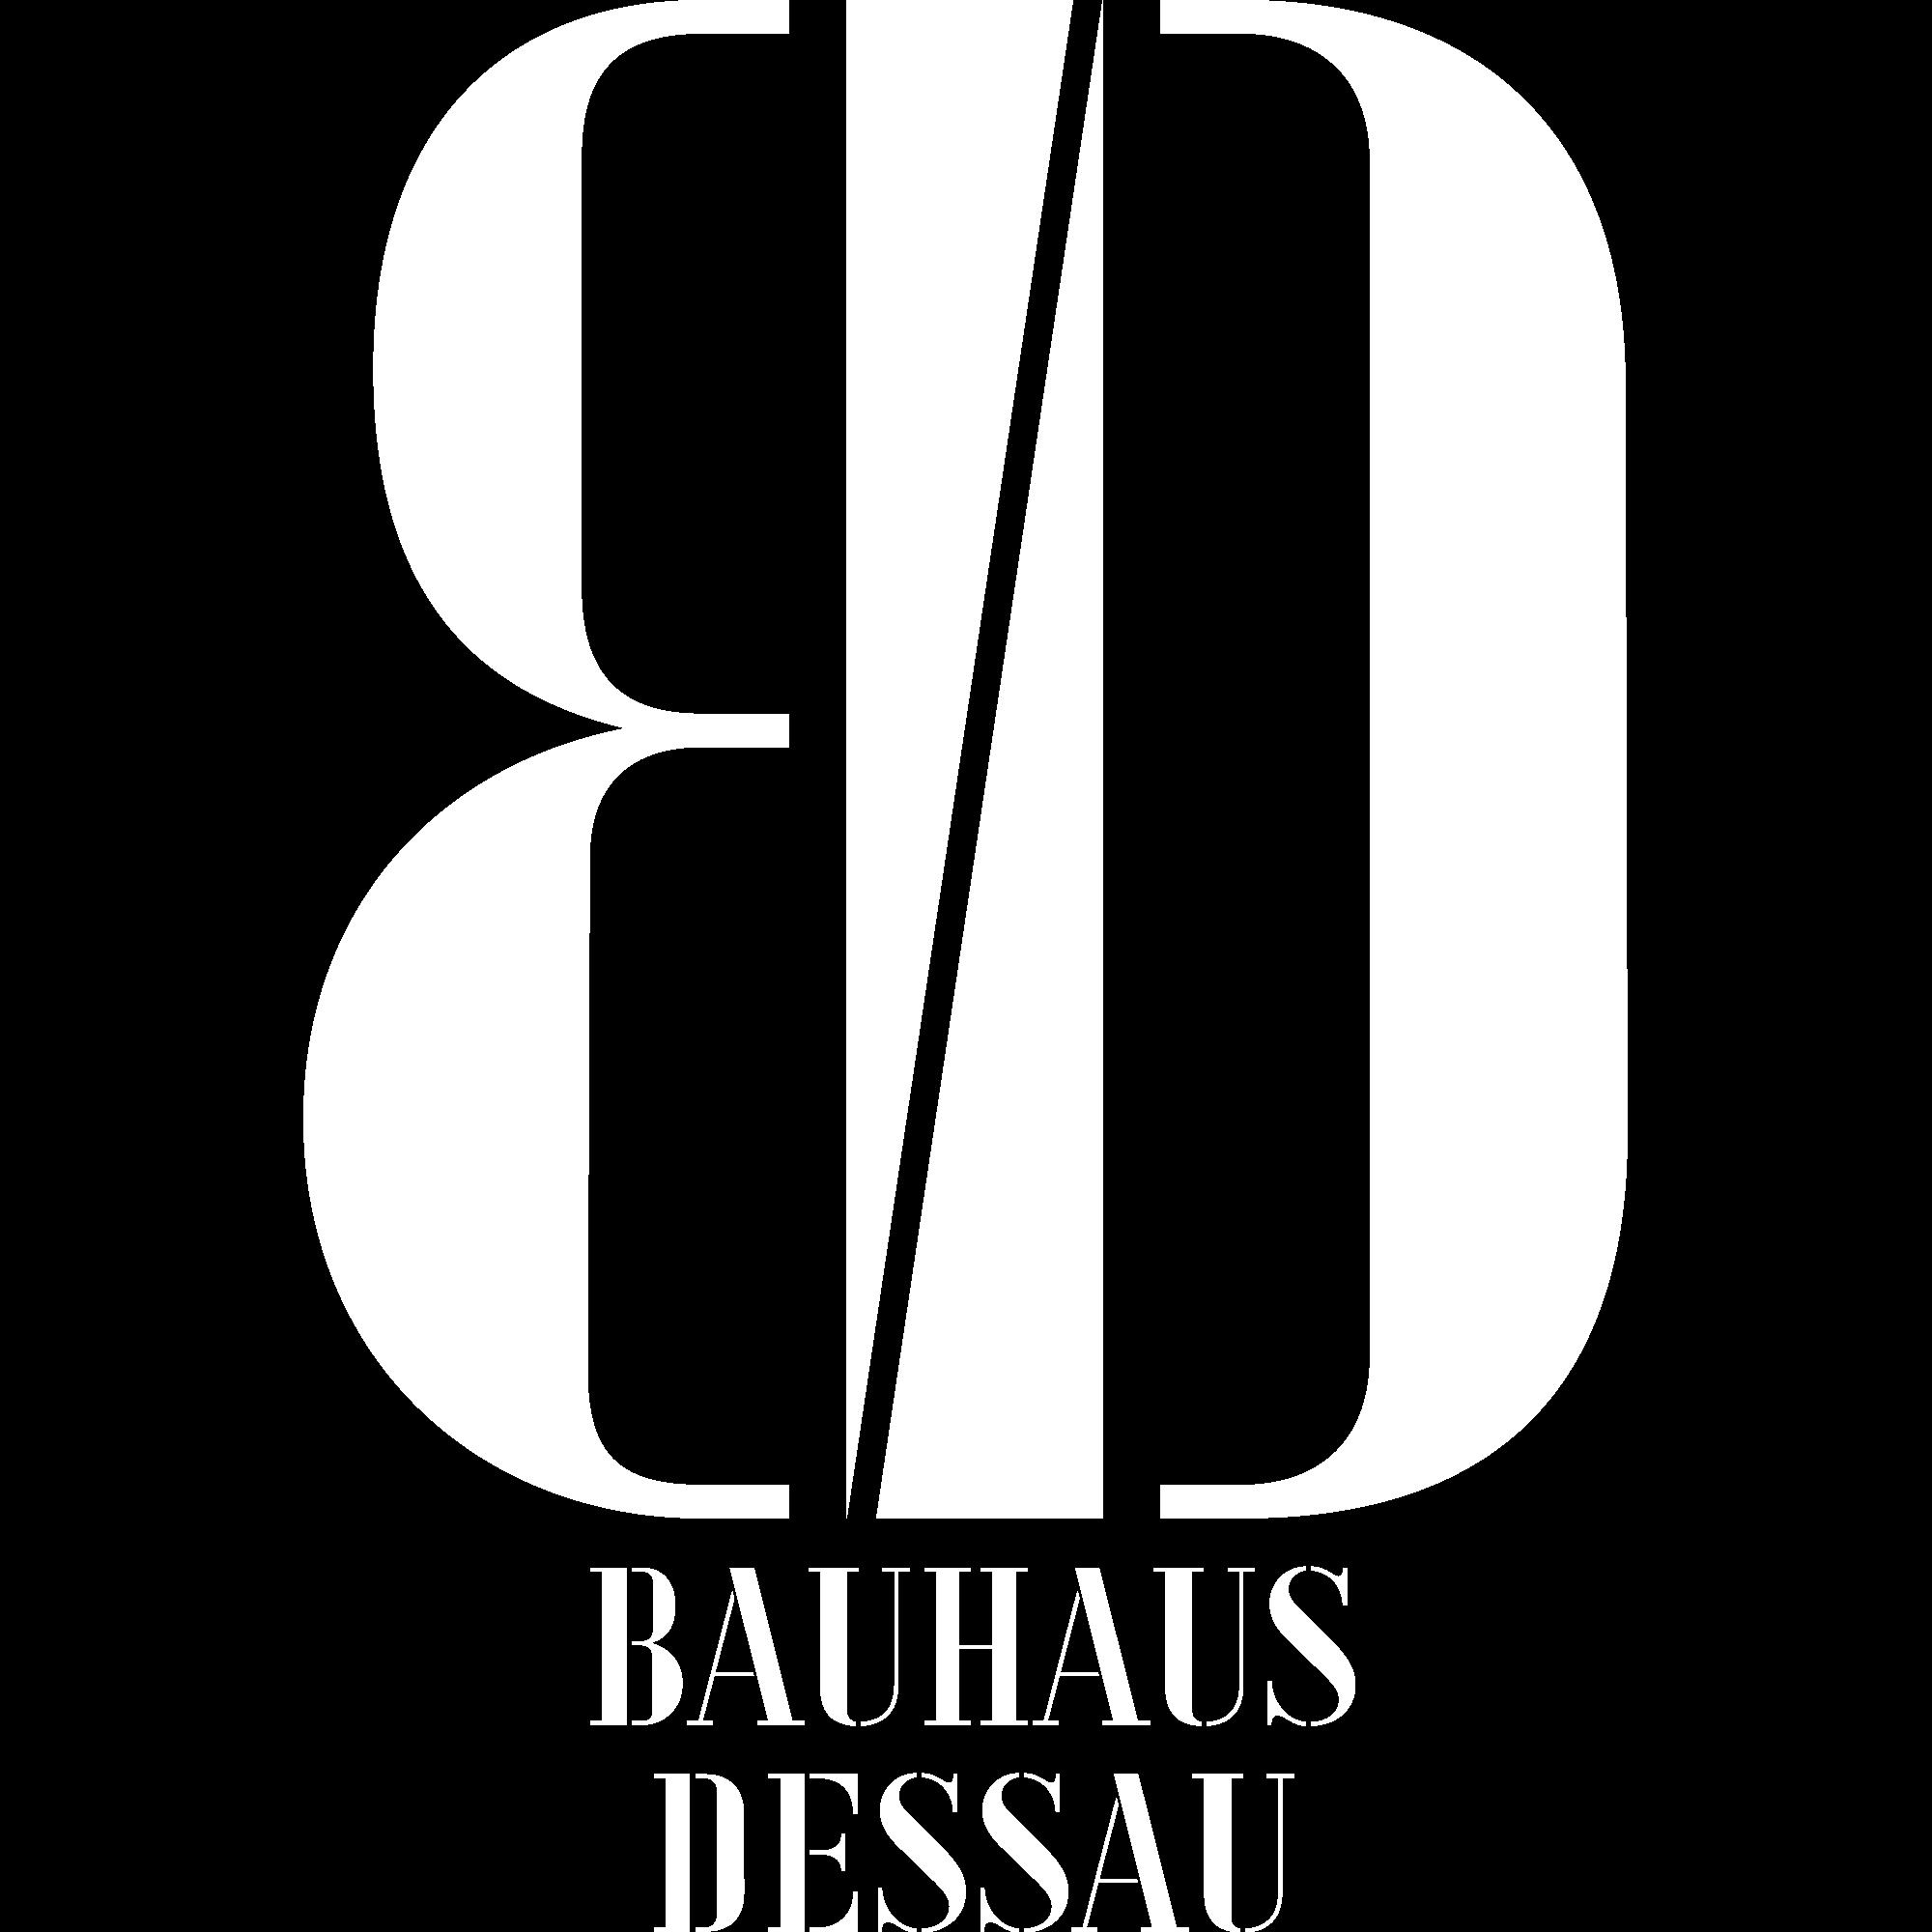 Adobe Hidden Treasures Bauhaus Dessau Logo